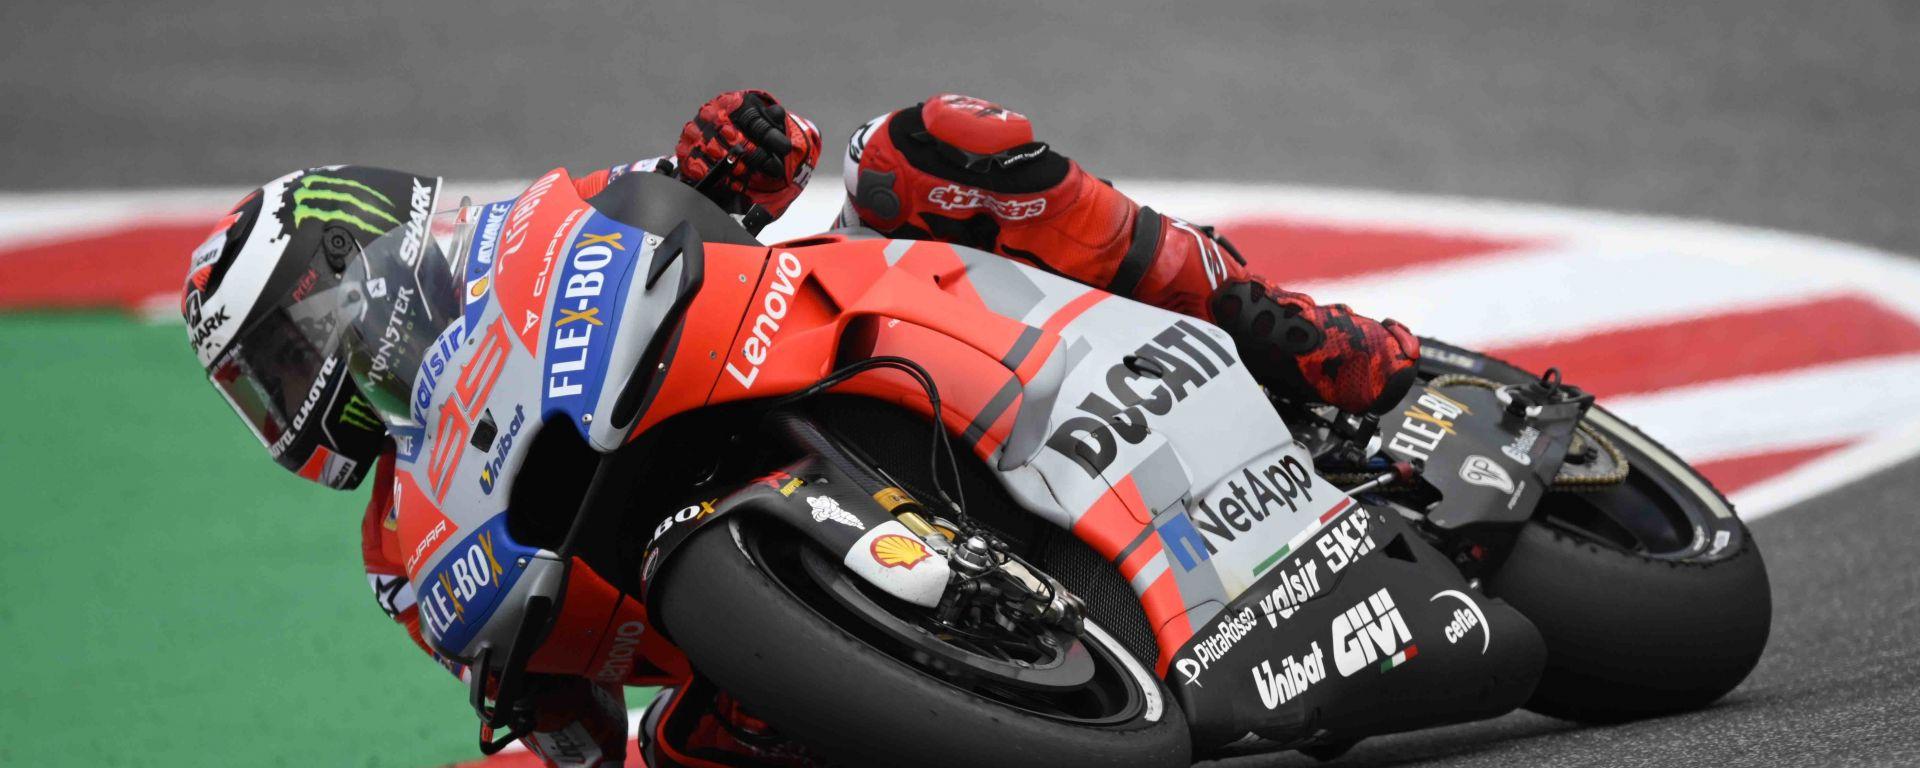 MotoGP Misano 2018: Jorge Lorenzo in pole davanti a Miller